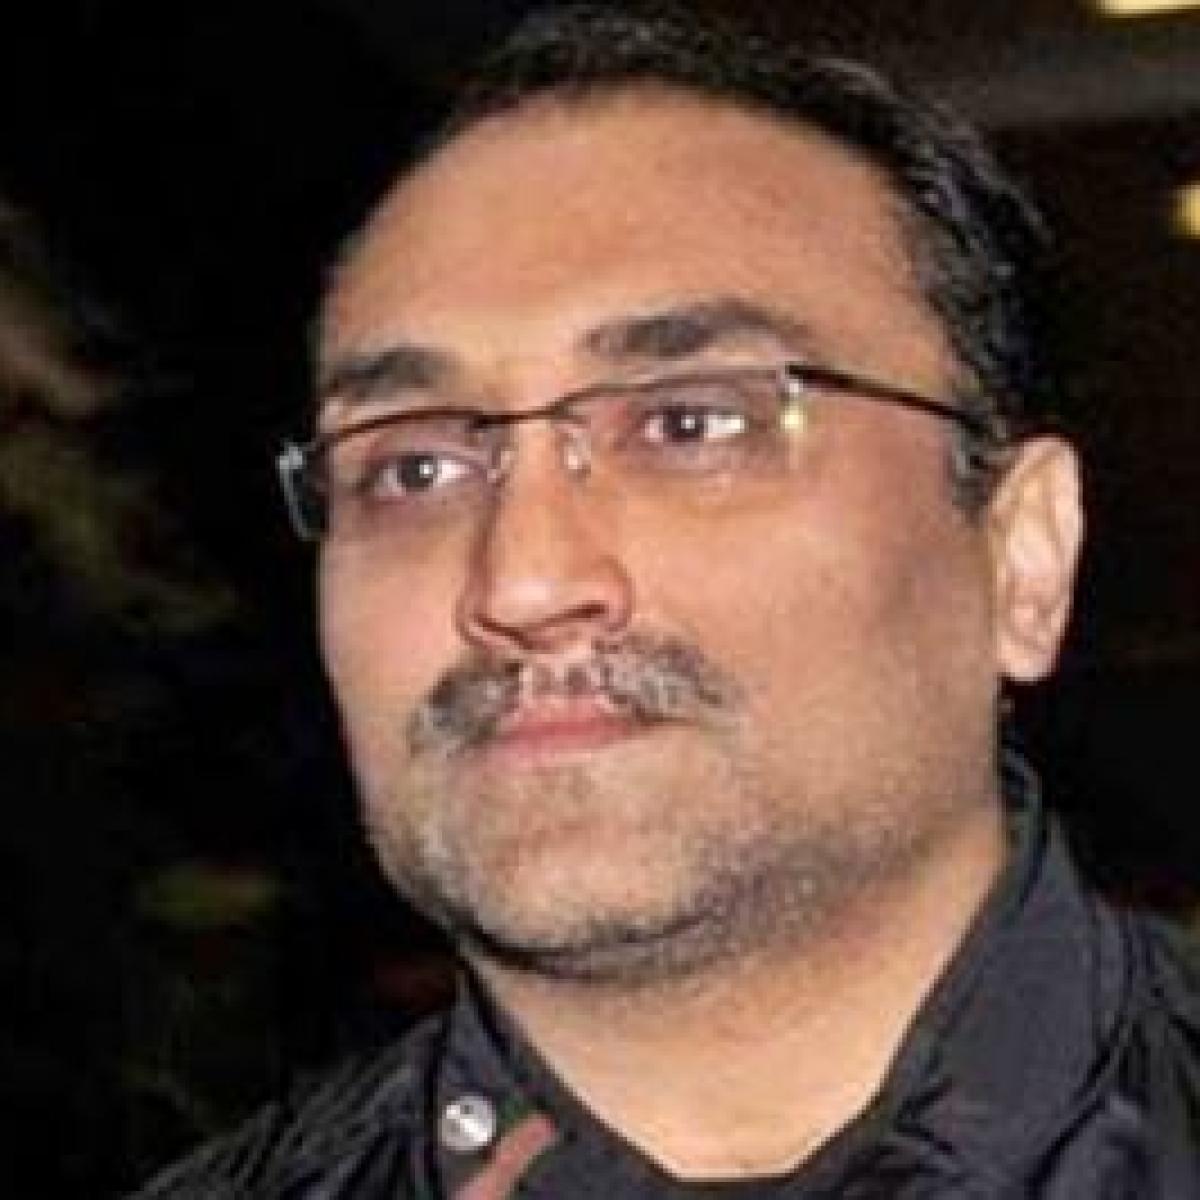 'Secret of YRF 50 are people': Aditya Chopra as he thanks industry on the birth anniversary of late Yash Chopra